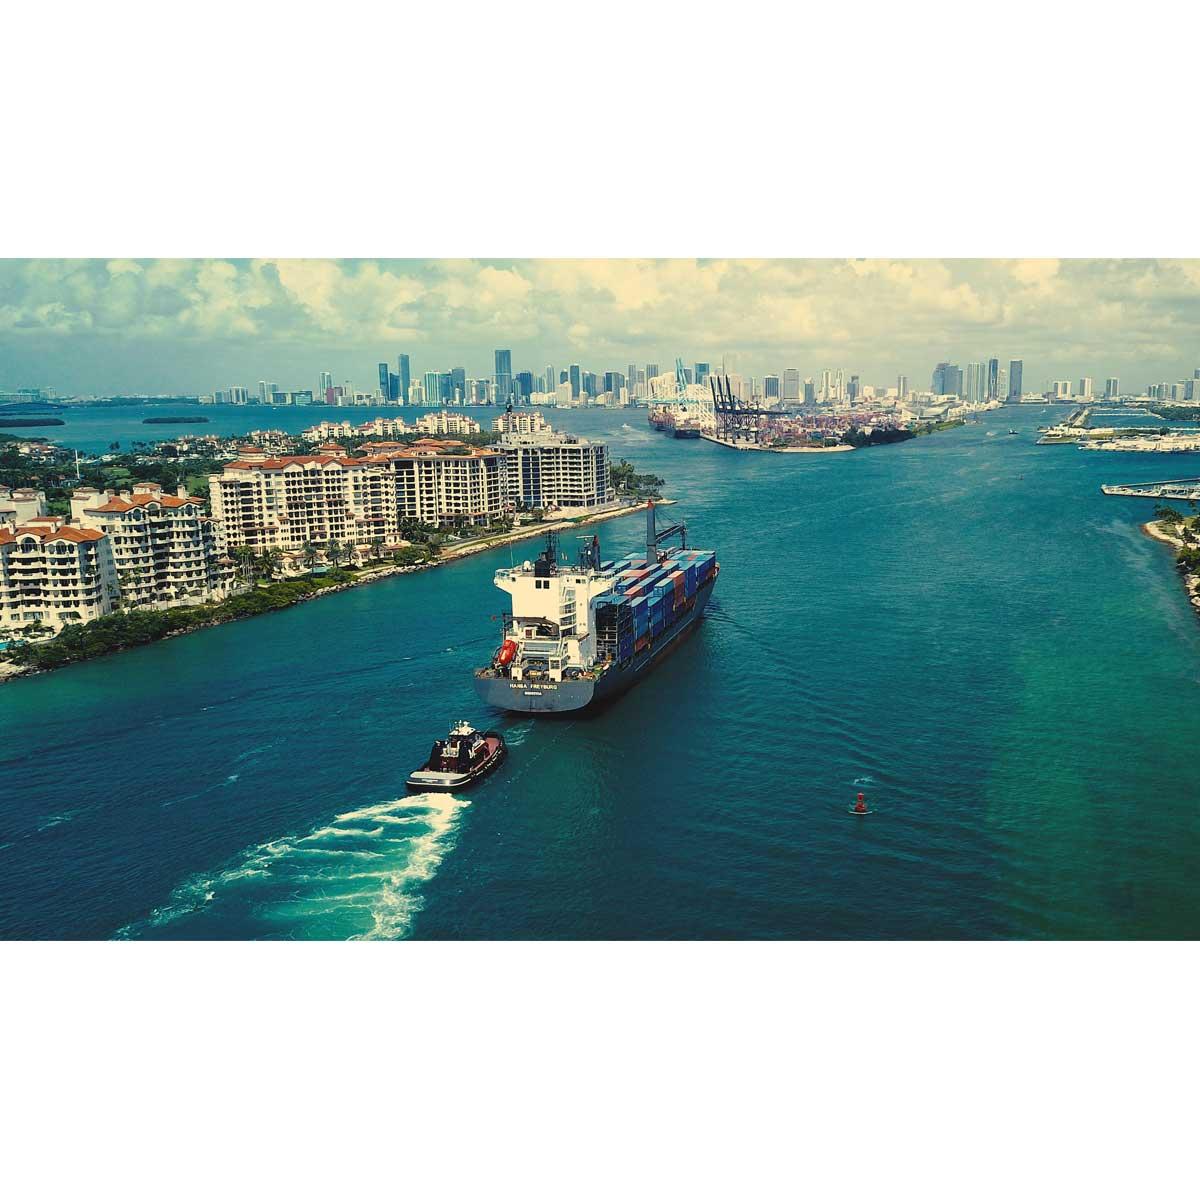 Miami Port: Best Quality Canvas